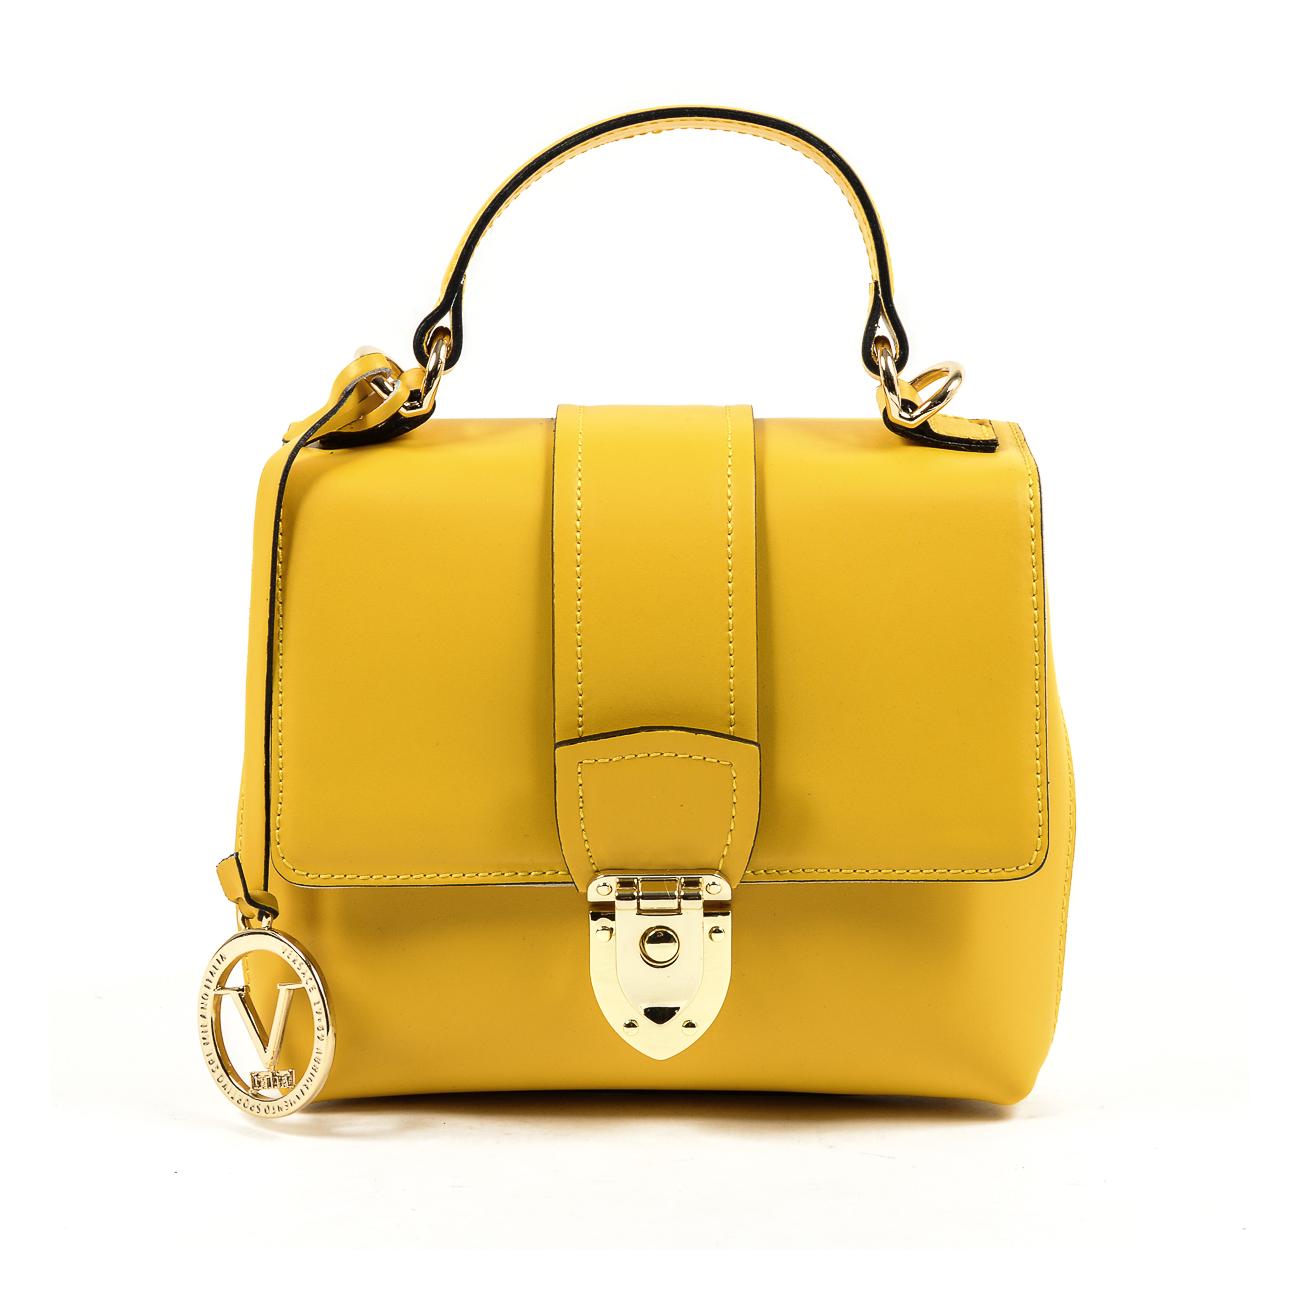 V 1969 Italia Womens Handbag Yellow Laos By Versace 19 69 Abliamento Sportivo Srl Milano Details N532 52 Ruga Giallo Off White Color